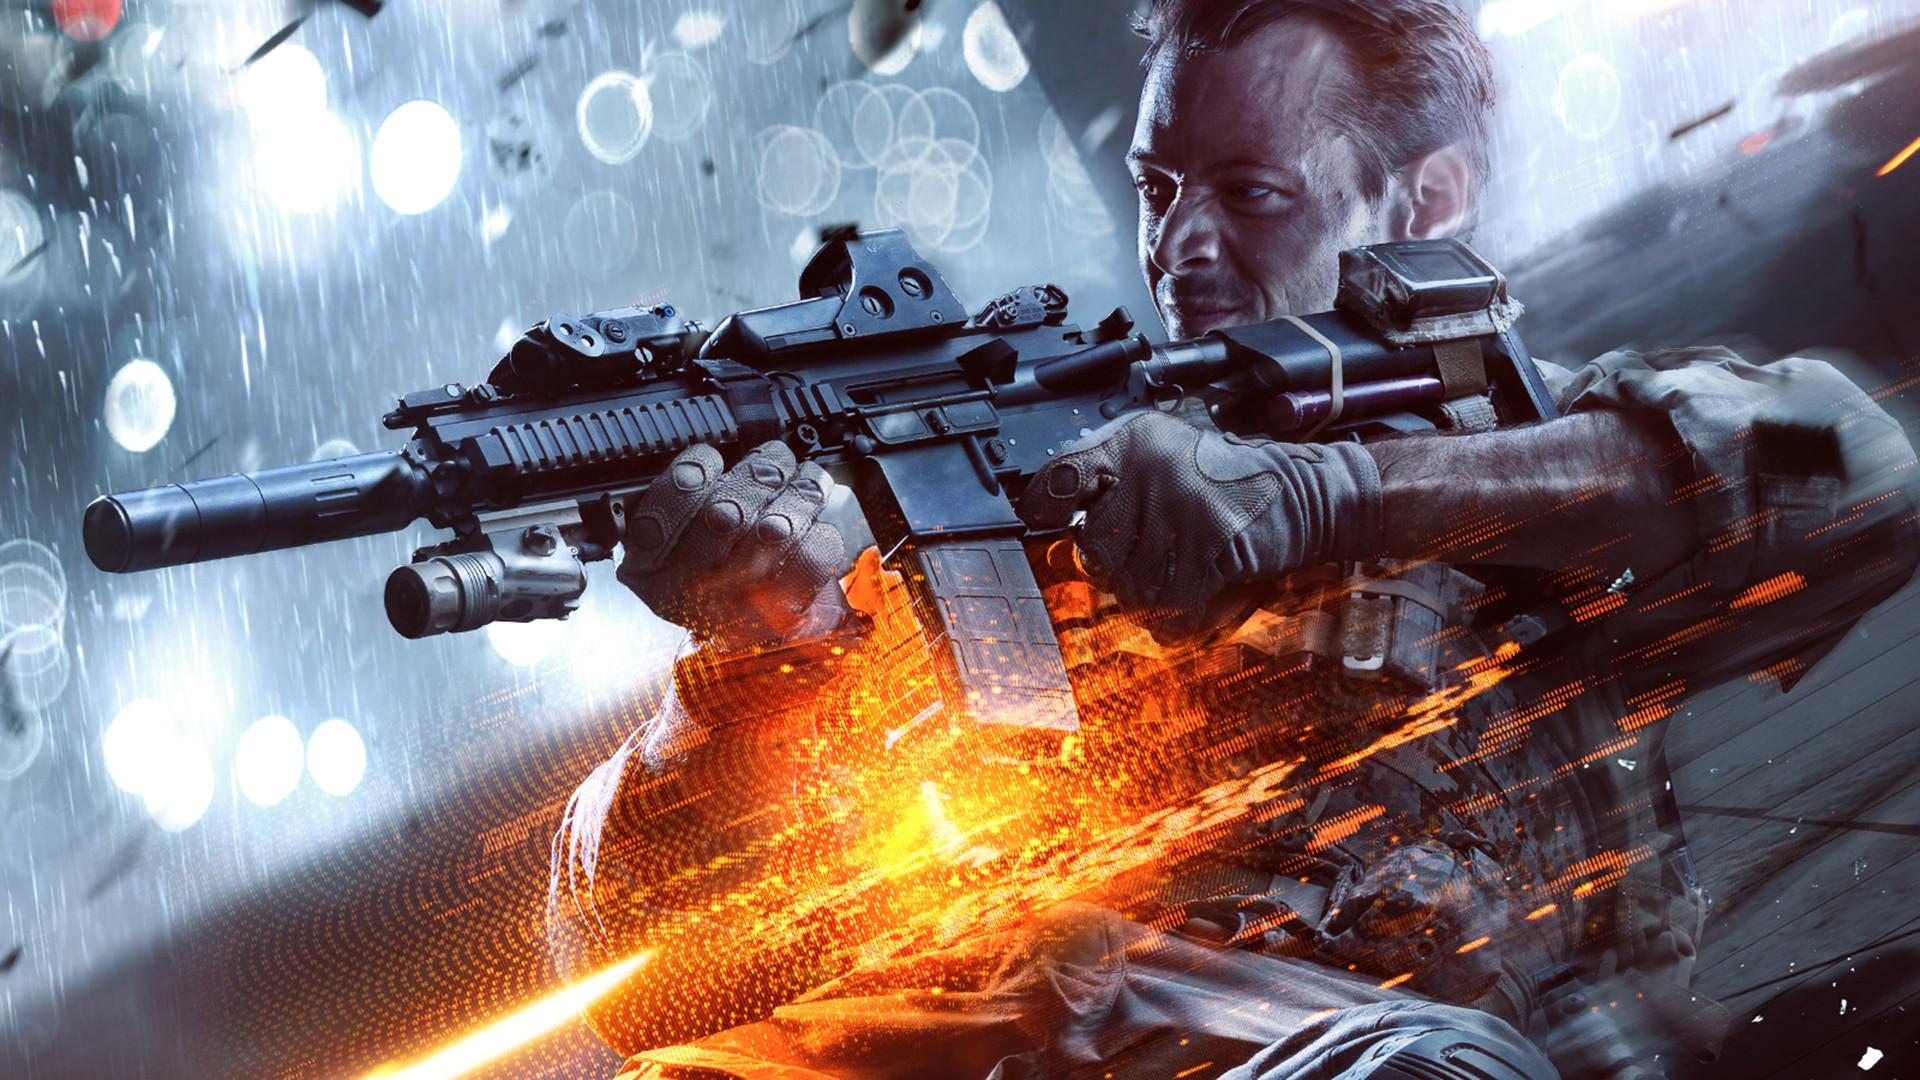 Download Wallpaper 1280x1280 Battlefield 4 Game Ea: Battlefield 4 Pc Game, HD Games, 4k Wallpapers, Images